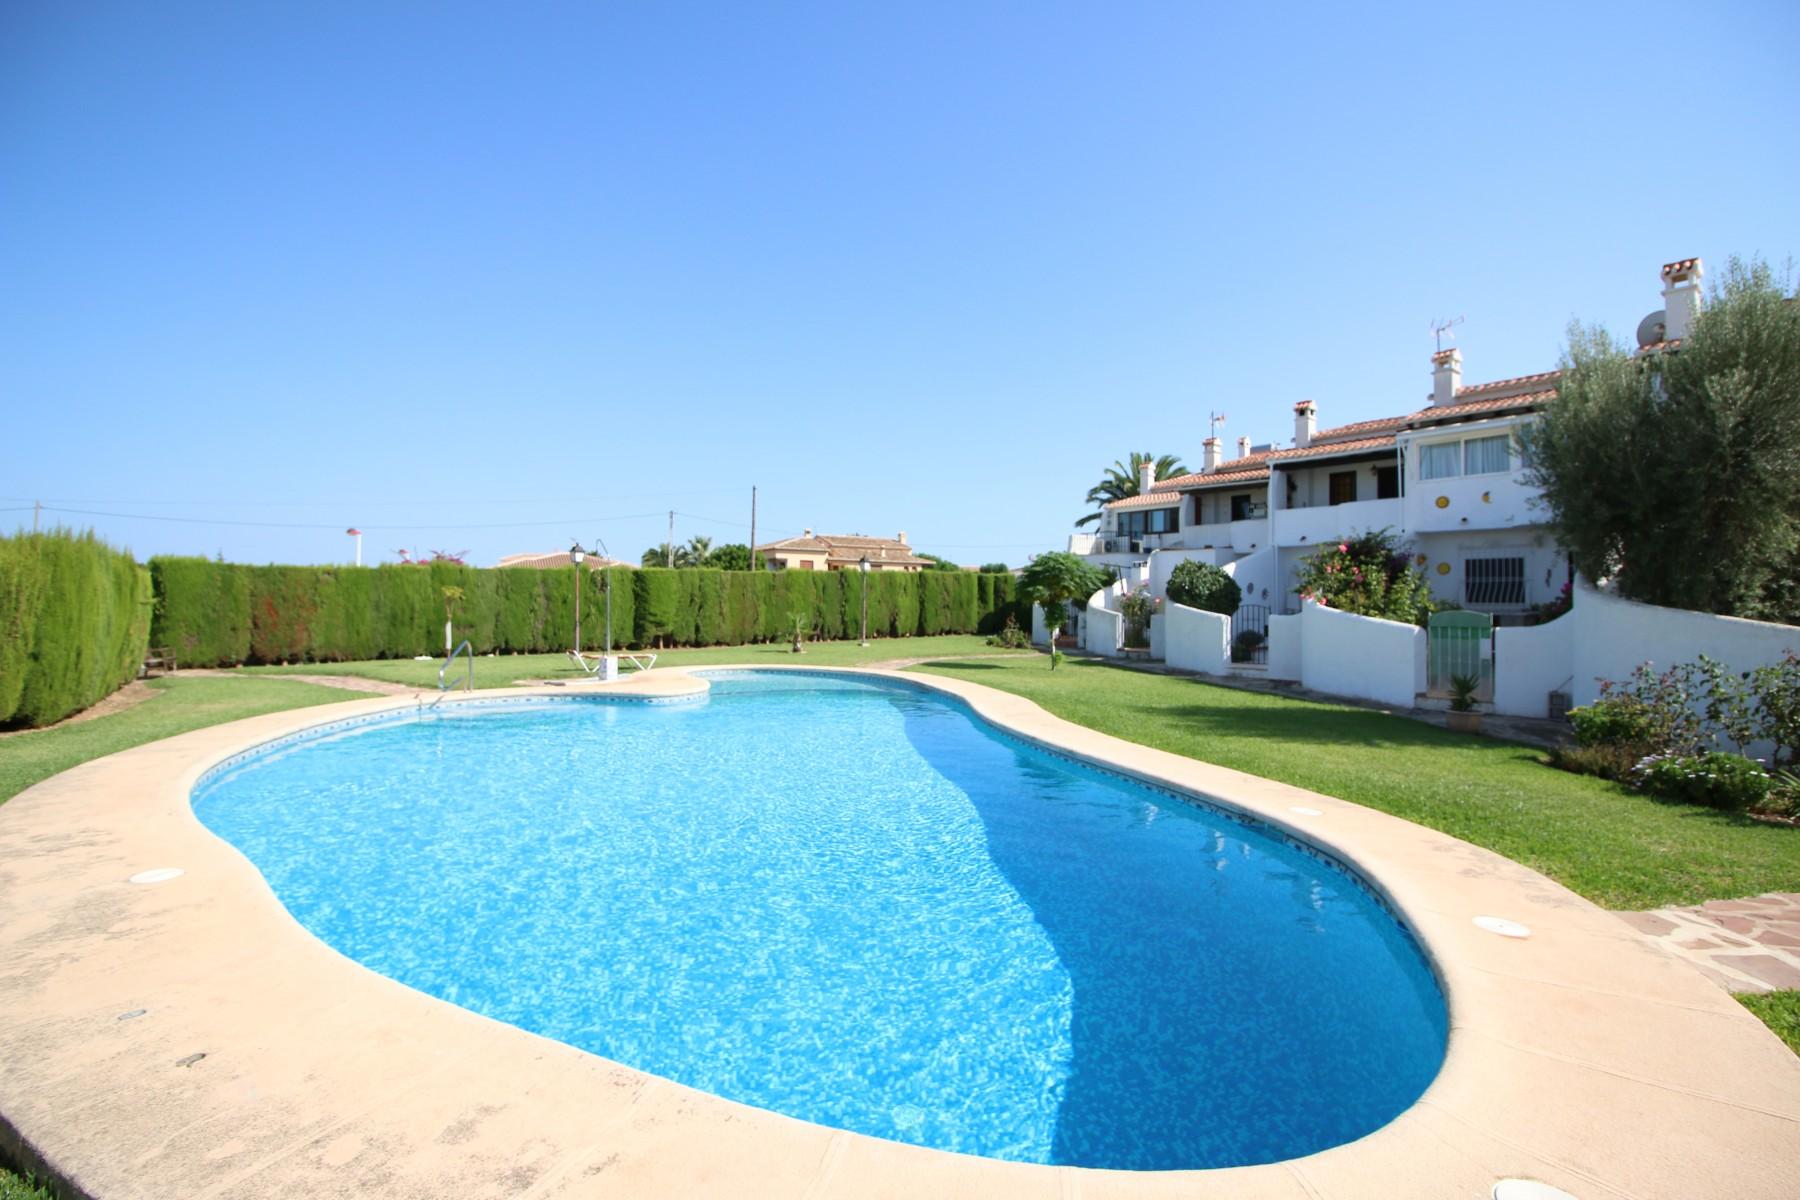 Villa Residencial Raco dels Tarongers,Denia,Costa Blanca #1